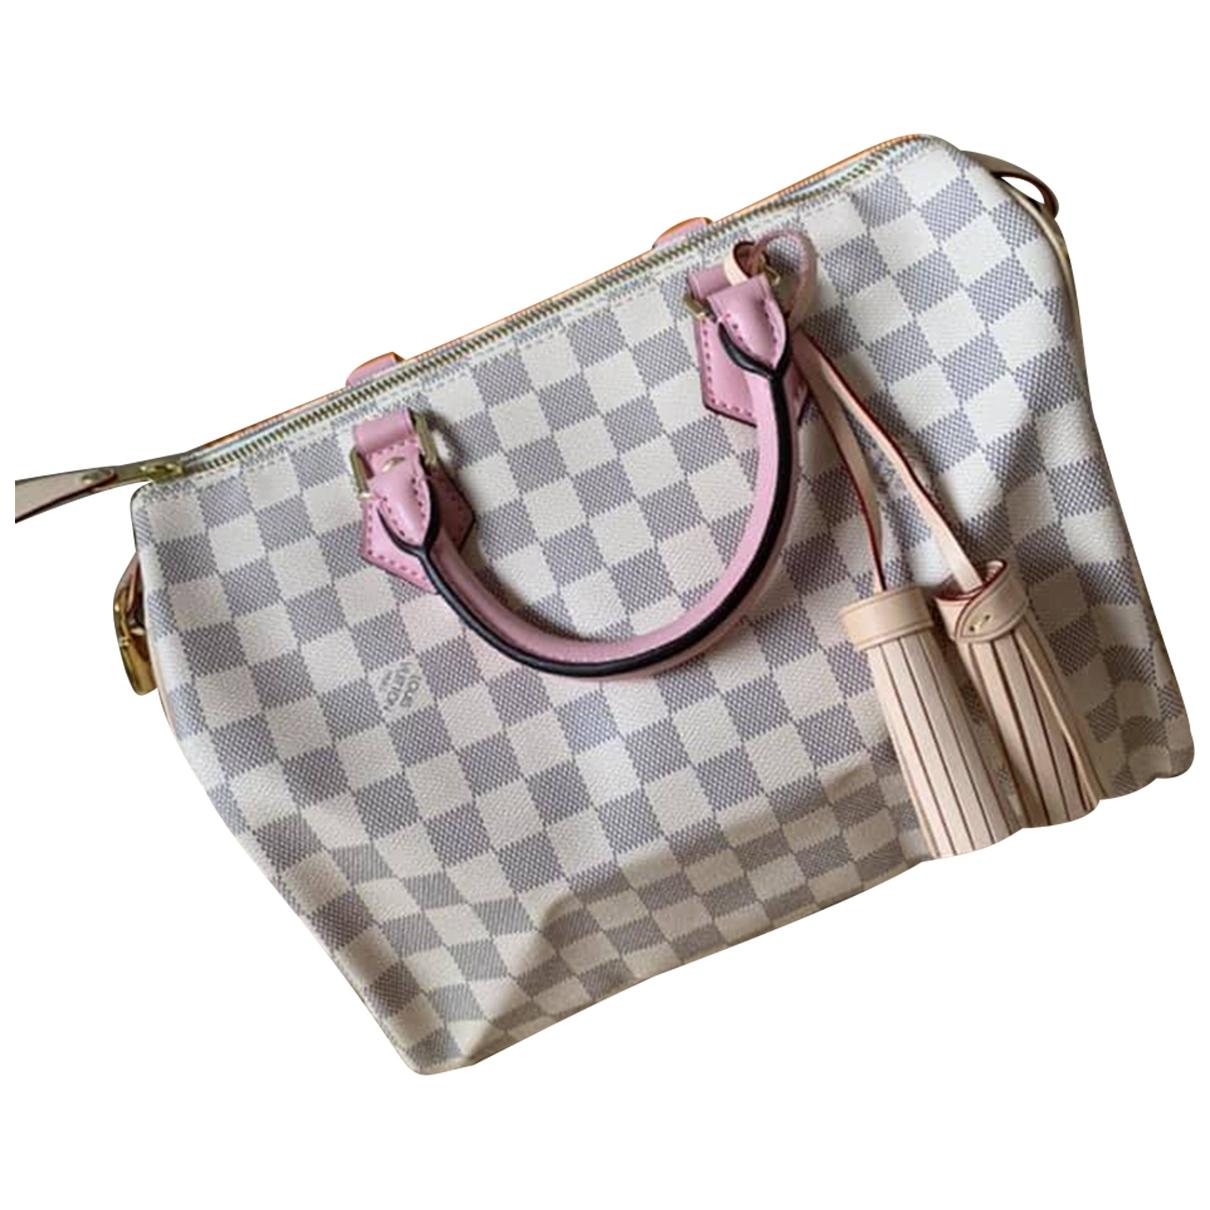 Bolso  Speedy Bandouliere de Lona Louis Vuitton